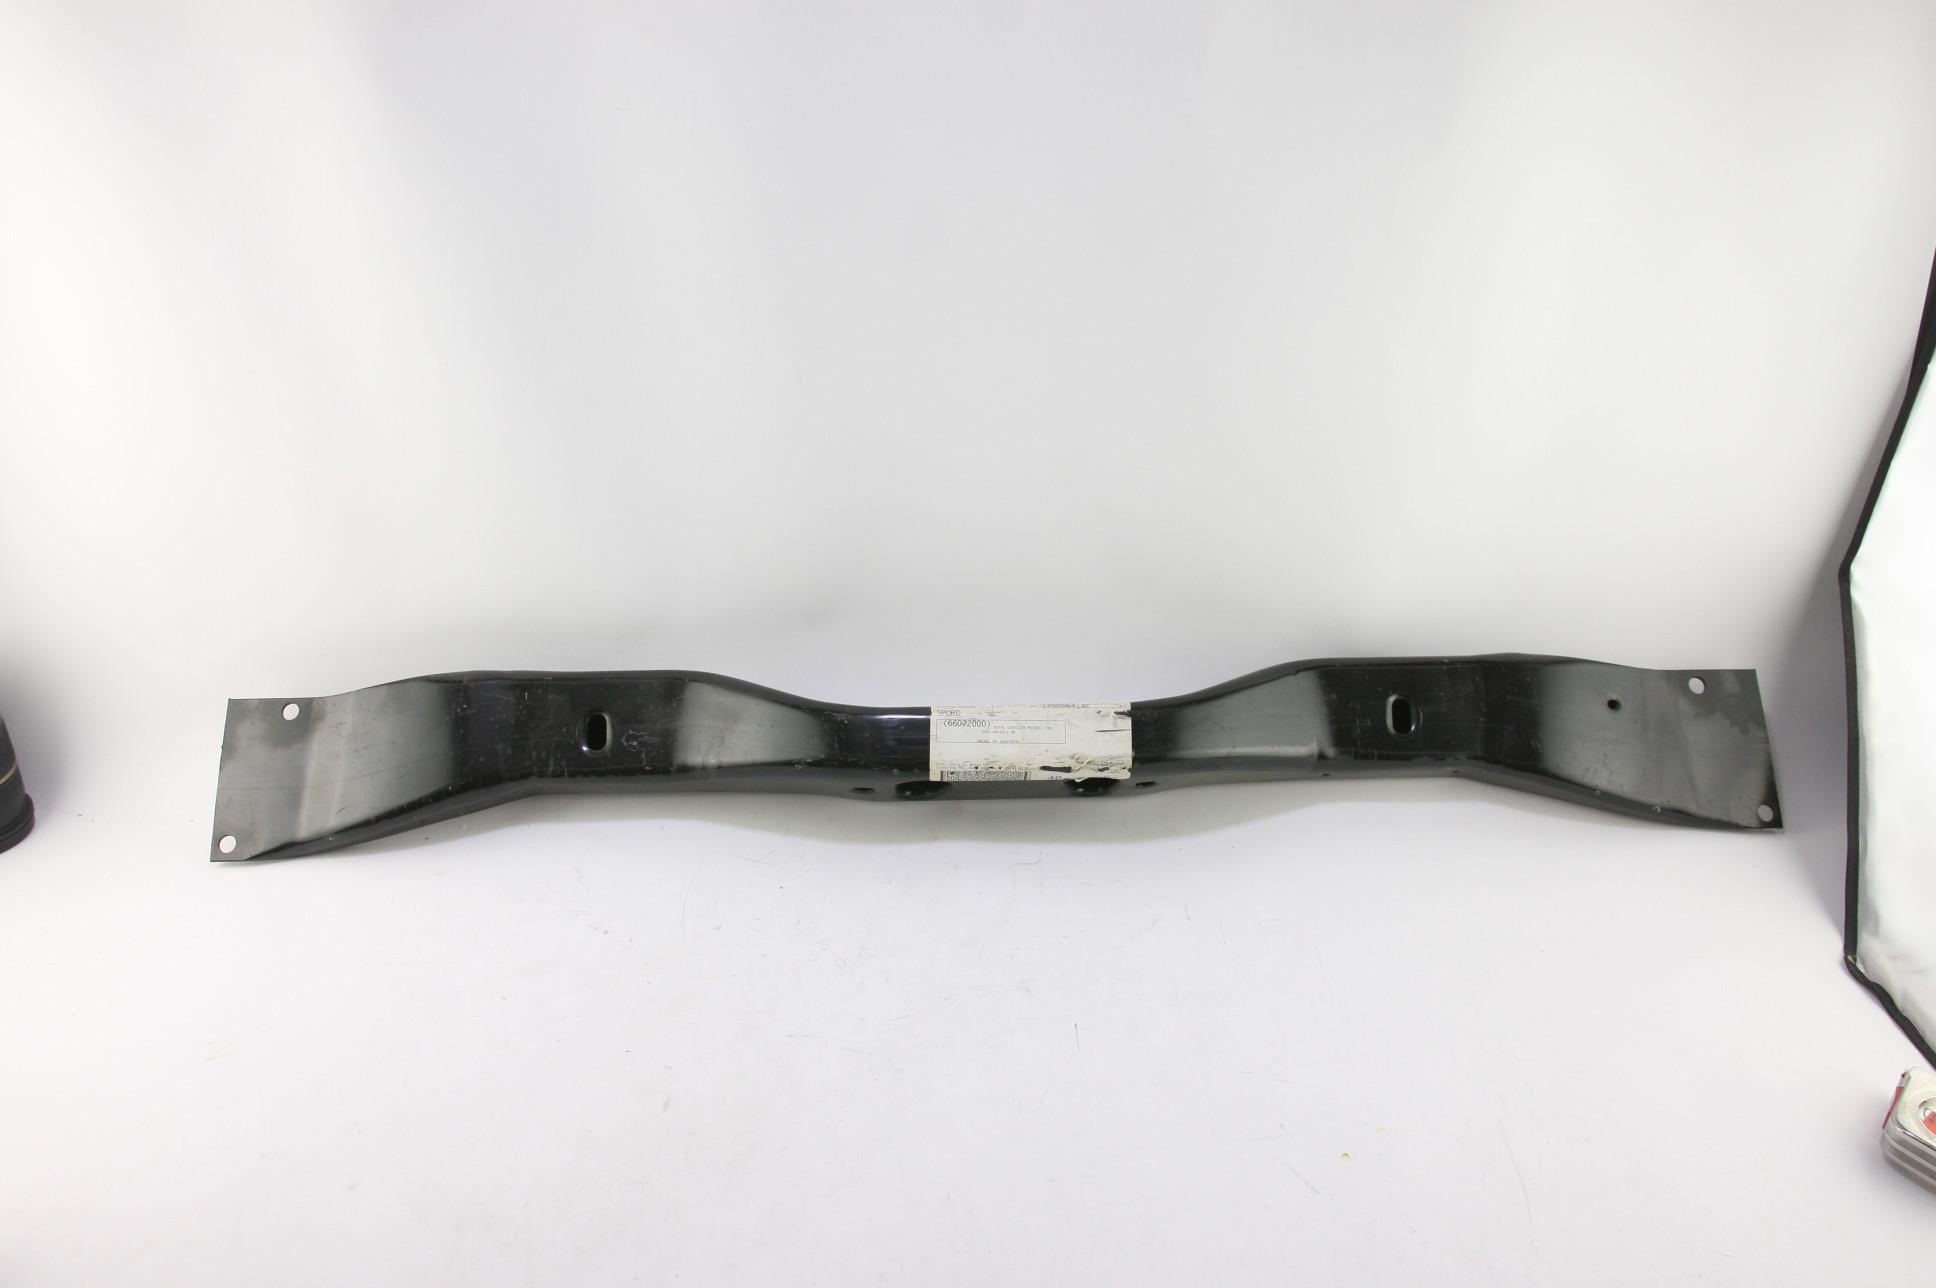 **** New OEM 4860439AC Radiator Core Support Upper Tie Bar Free Shipping NIP - image 1